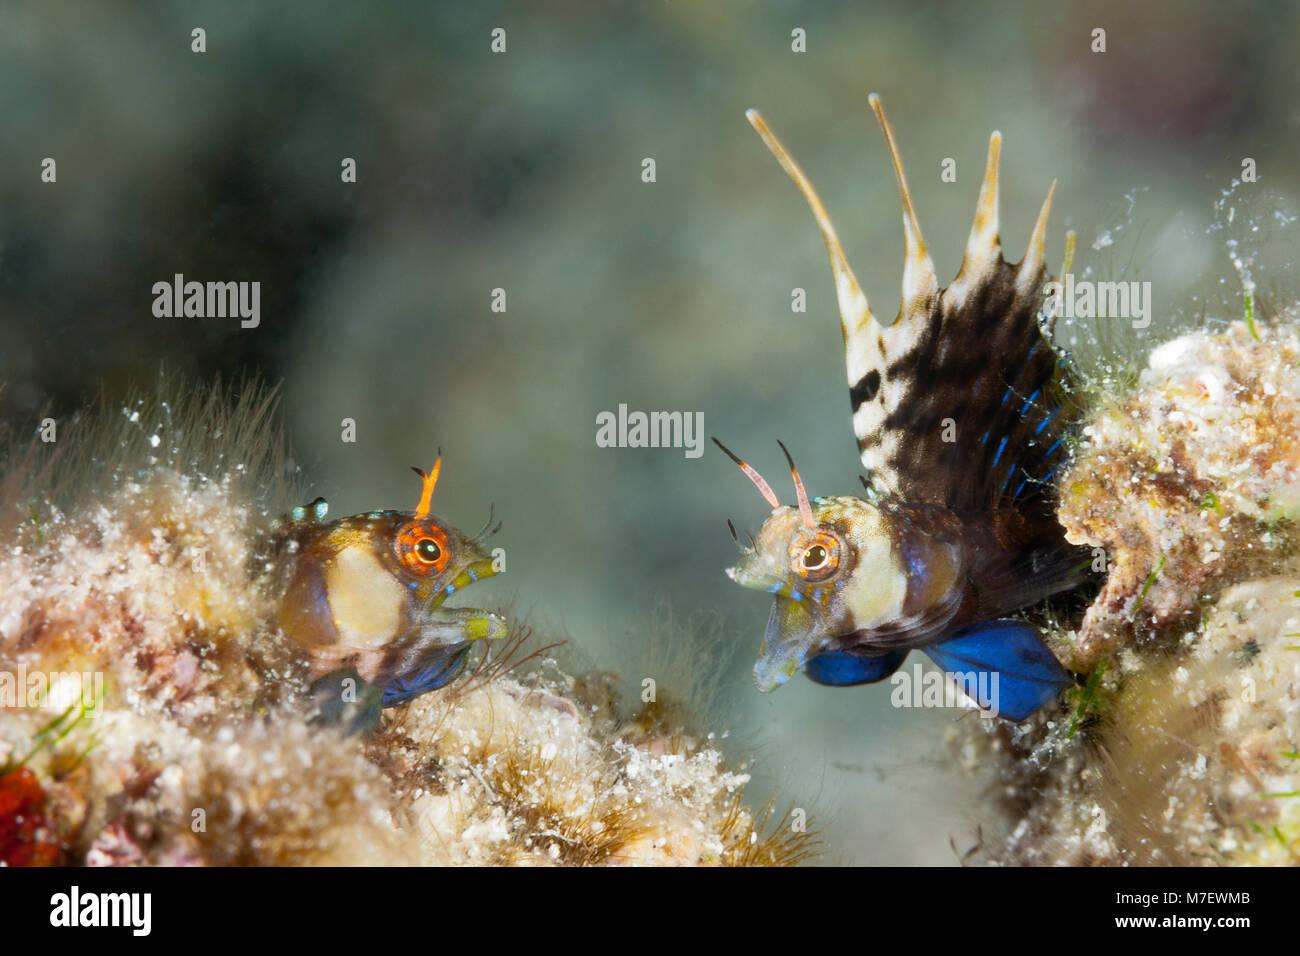 Elusive Signal Blennies in threatening posture, Emblemaria walkeri, La Paz, Baja California Sur, Mexico Stock Photo